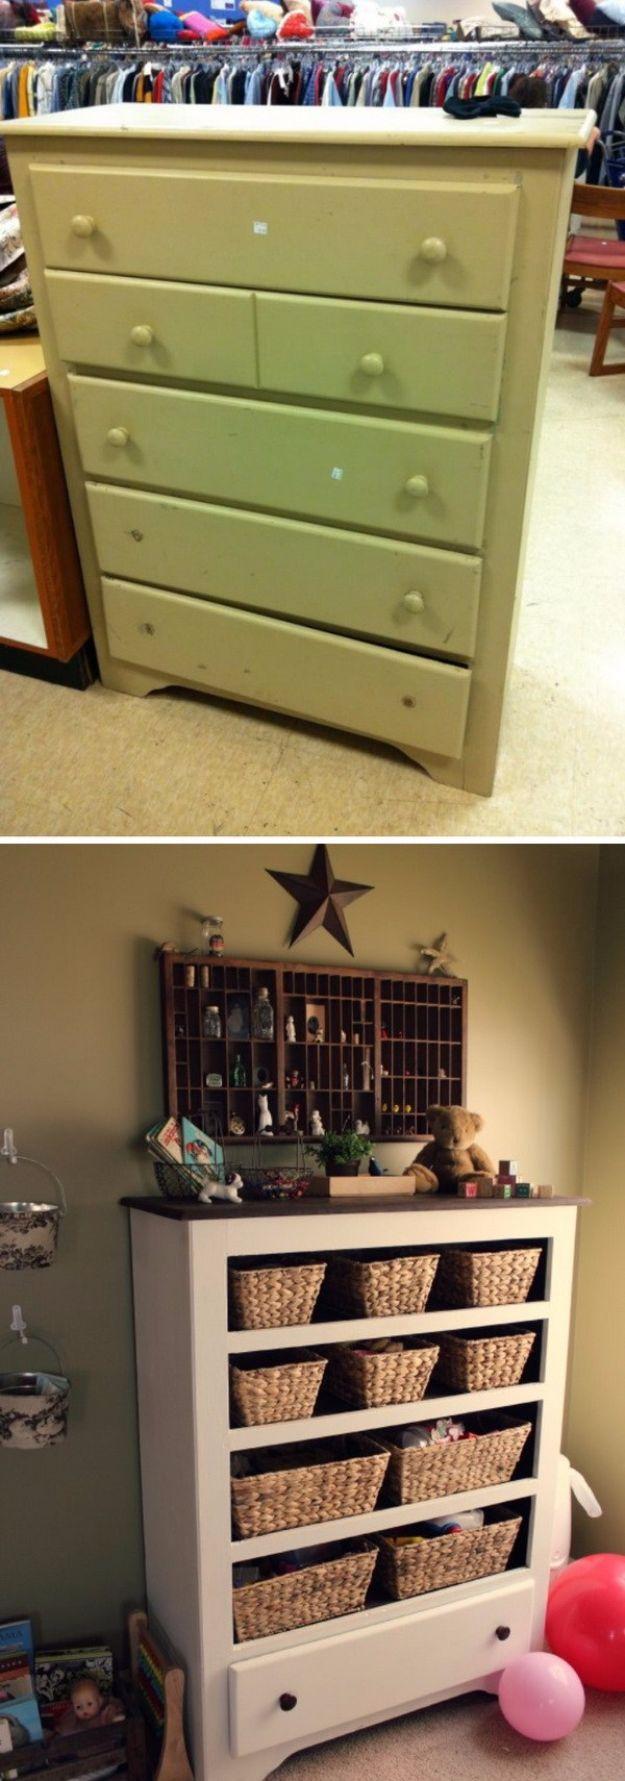 Best Furniture Hacks - Old Dresser Into A Functional Storage - Easy DIY Furniture Makeover Ideas for Cheap Home Decor - IKEA Hack Tutorials, Dressers, Cribs, Storage, For Kids, Bedroom and Good Ideas for Bath - Anthropologie, Walmart, Kmart, Target http://diyjoy.com/best-furniture-hacks